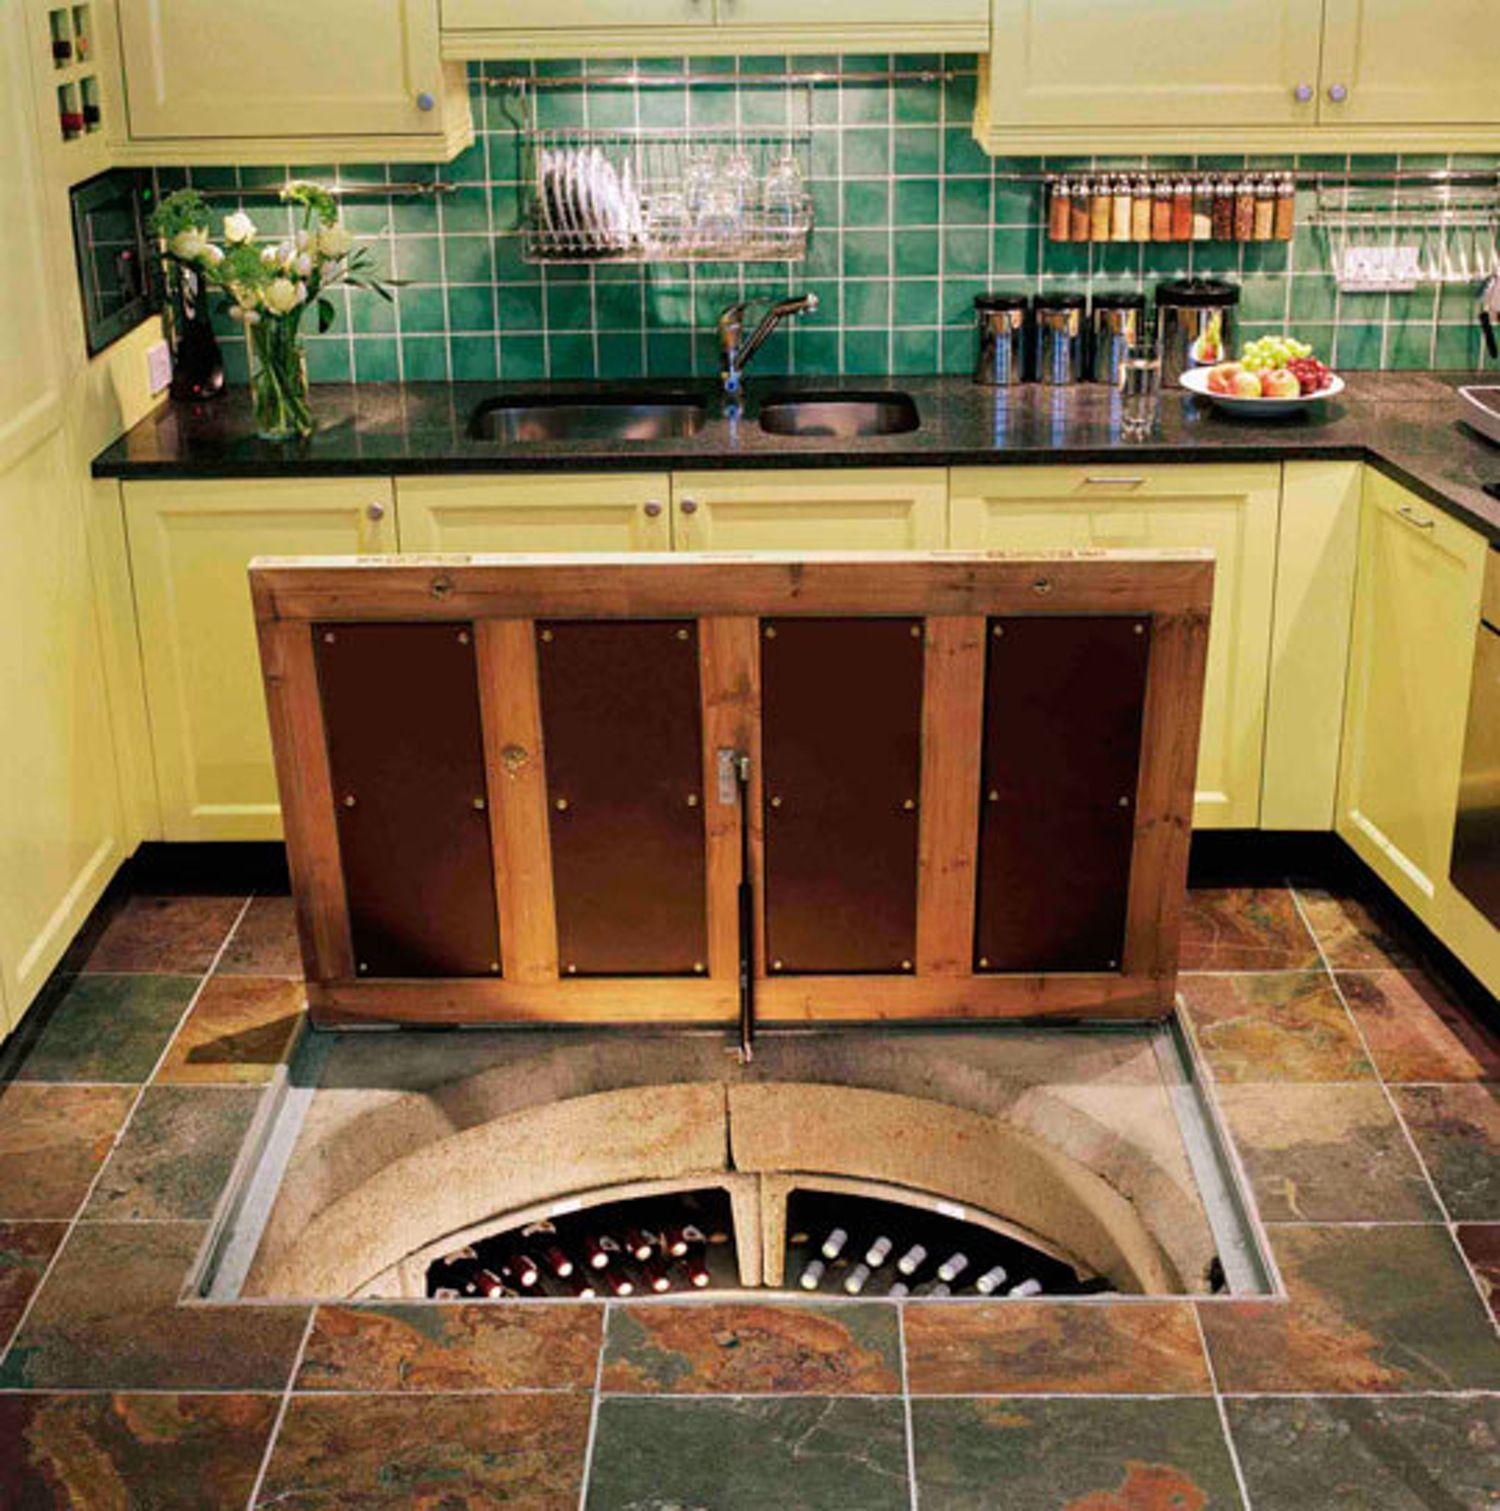 Trap Door Wine Cellar Trapdoor In The Kitchen Floor Spiral Wine Cellars  The O'jays